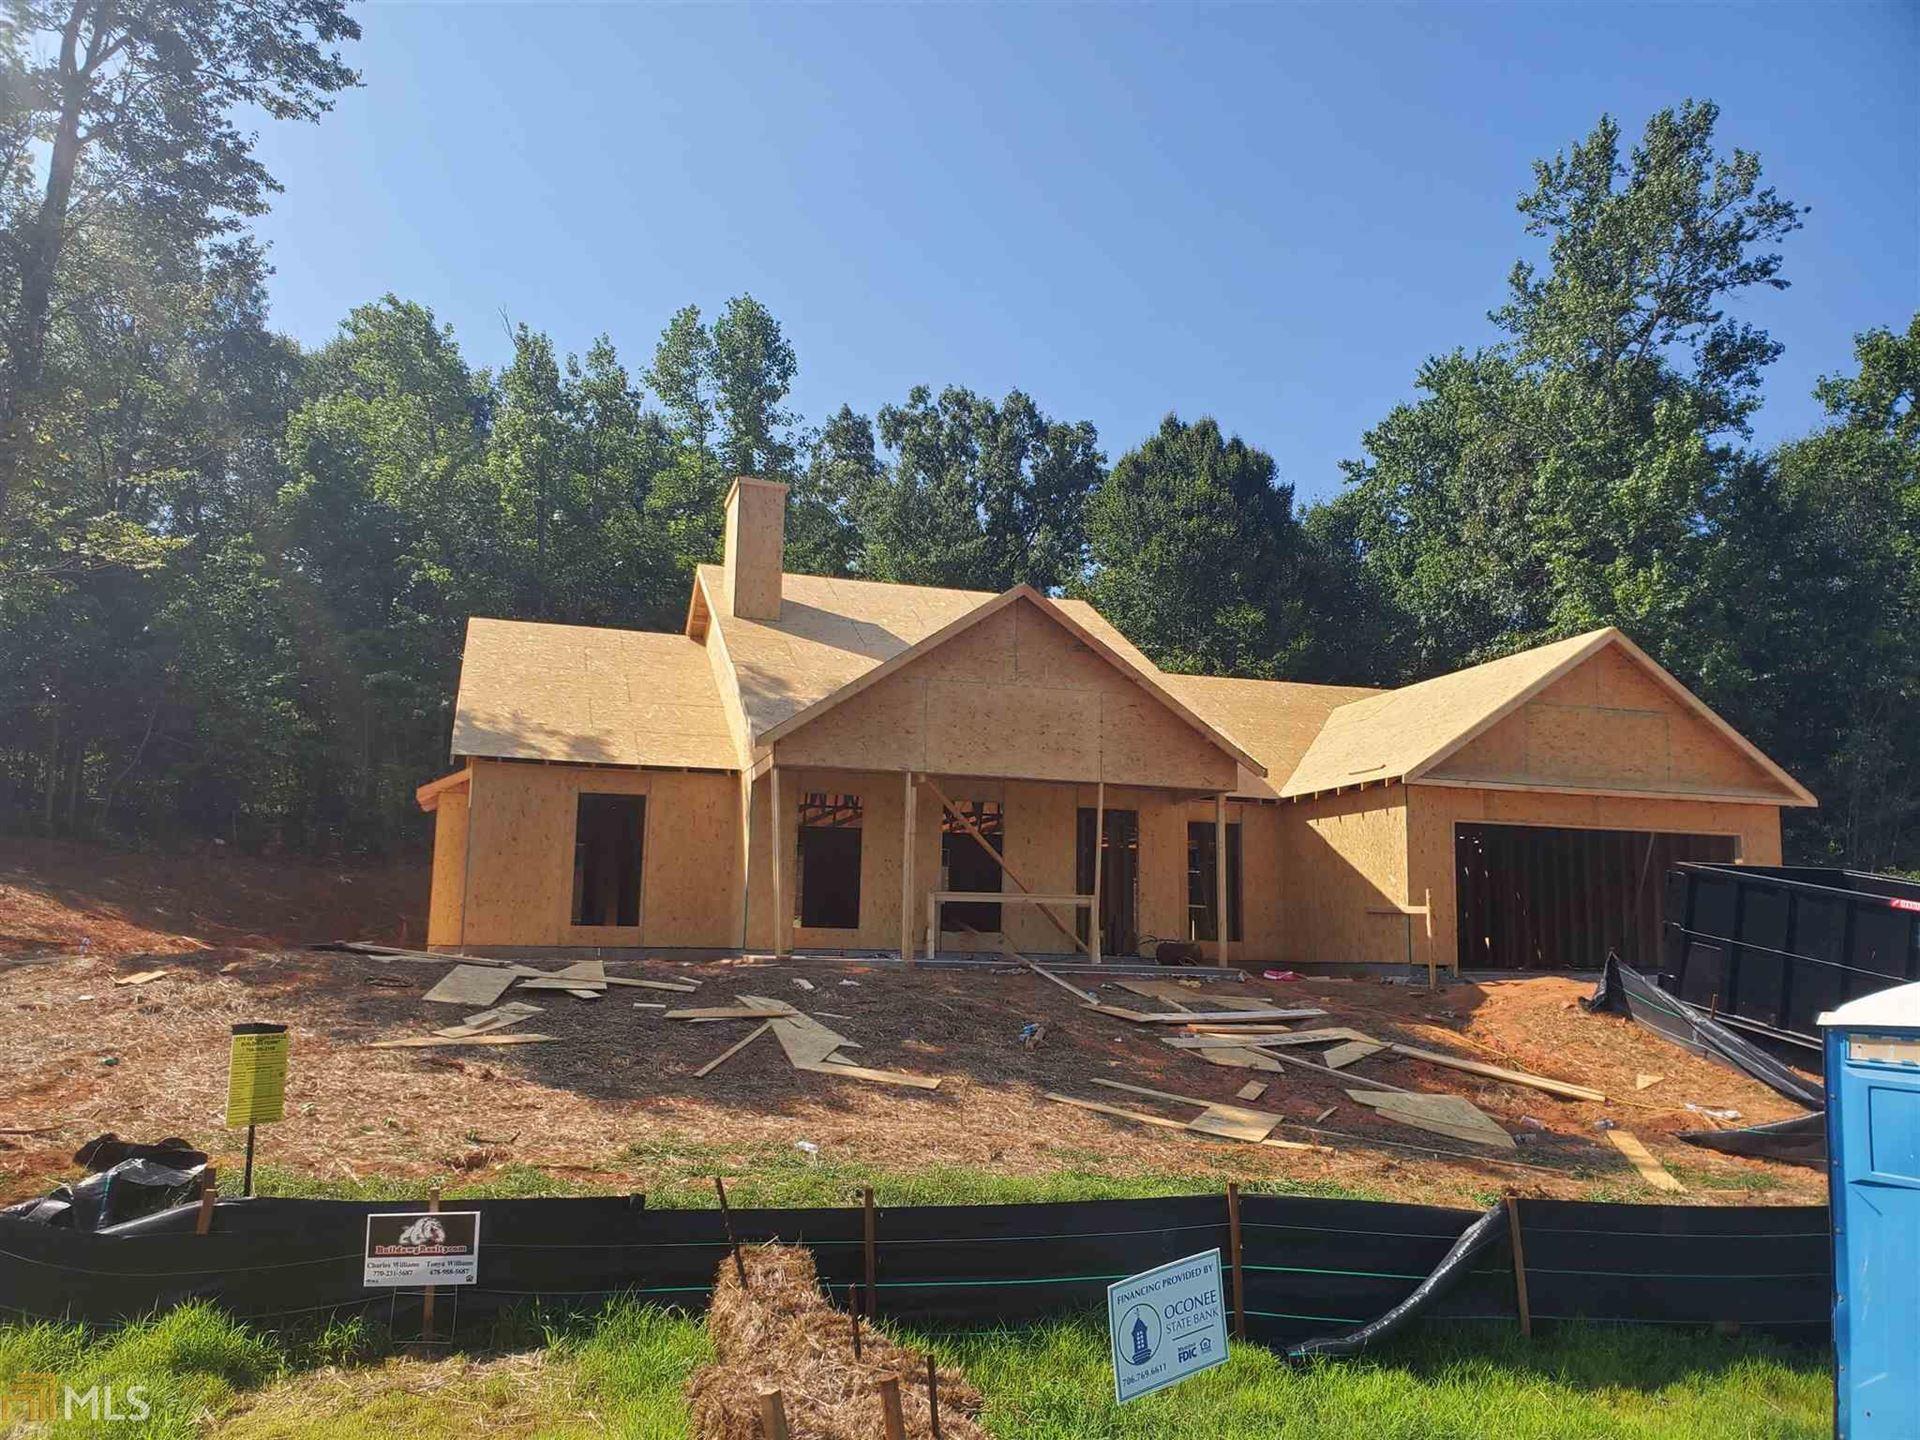 83 Long Estates Dr, Danielsville, GA 30633 - #: 8824260